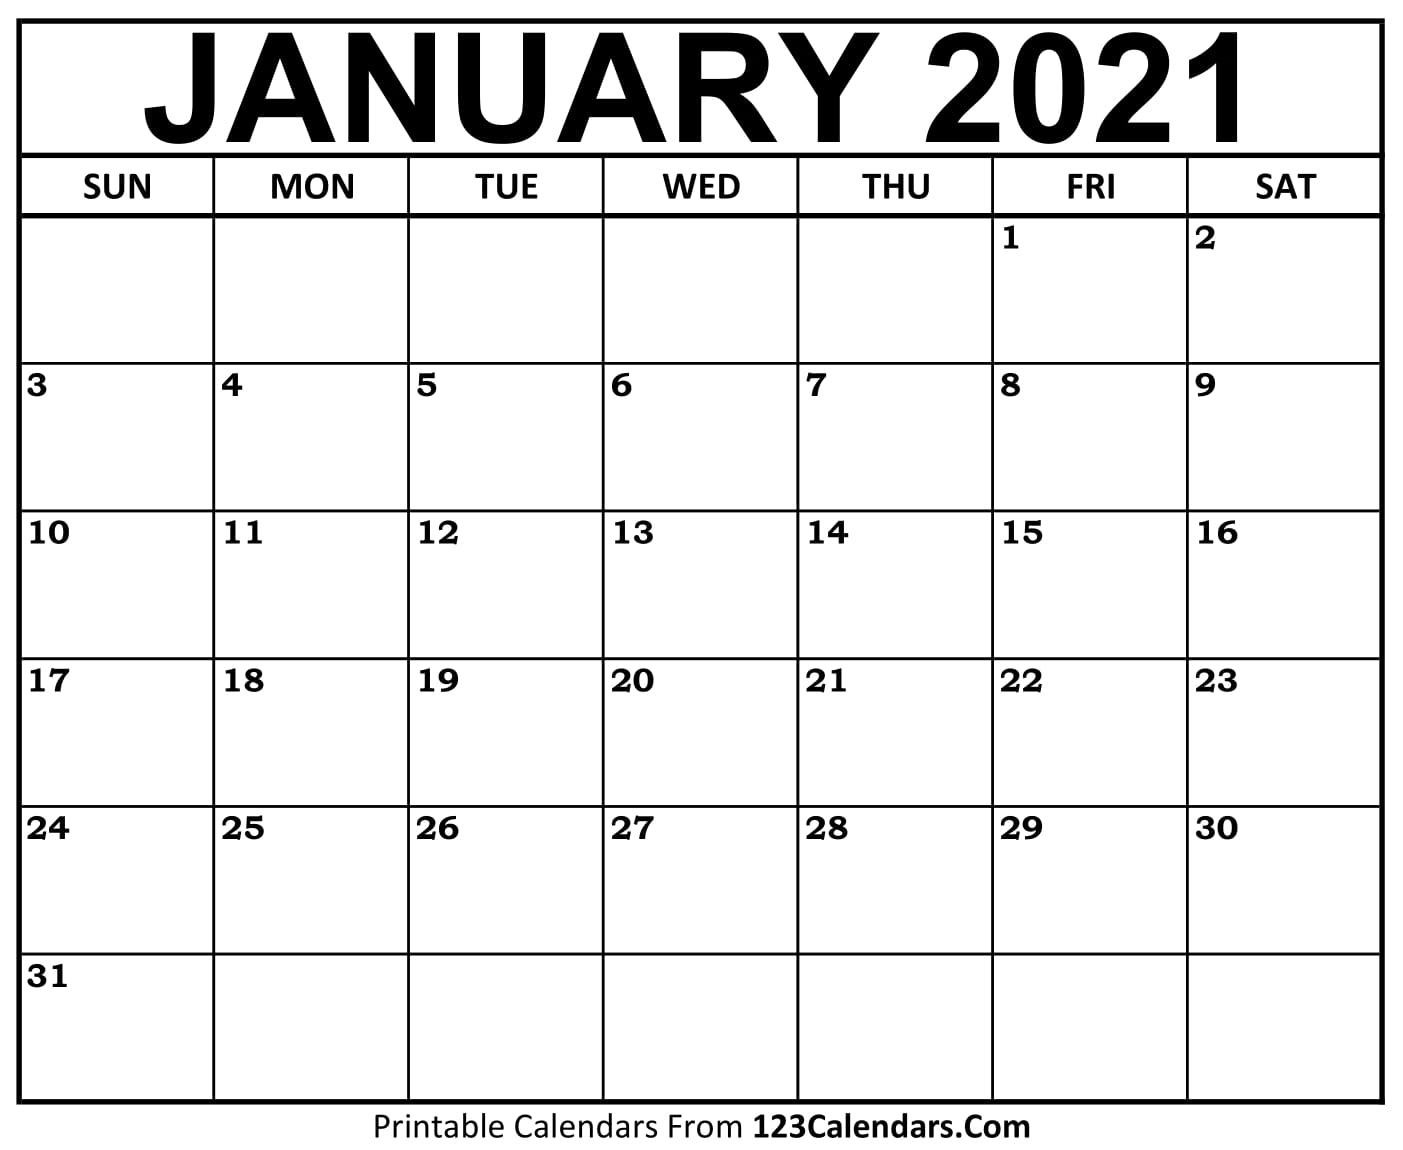 Printable January 2021 Calendar Templates   123Calendars